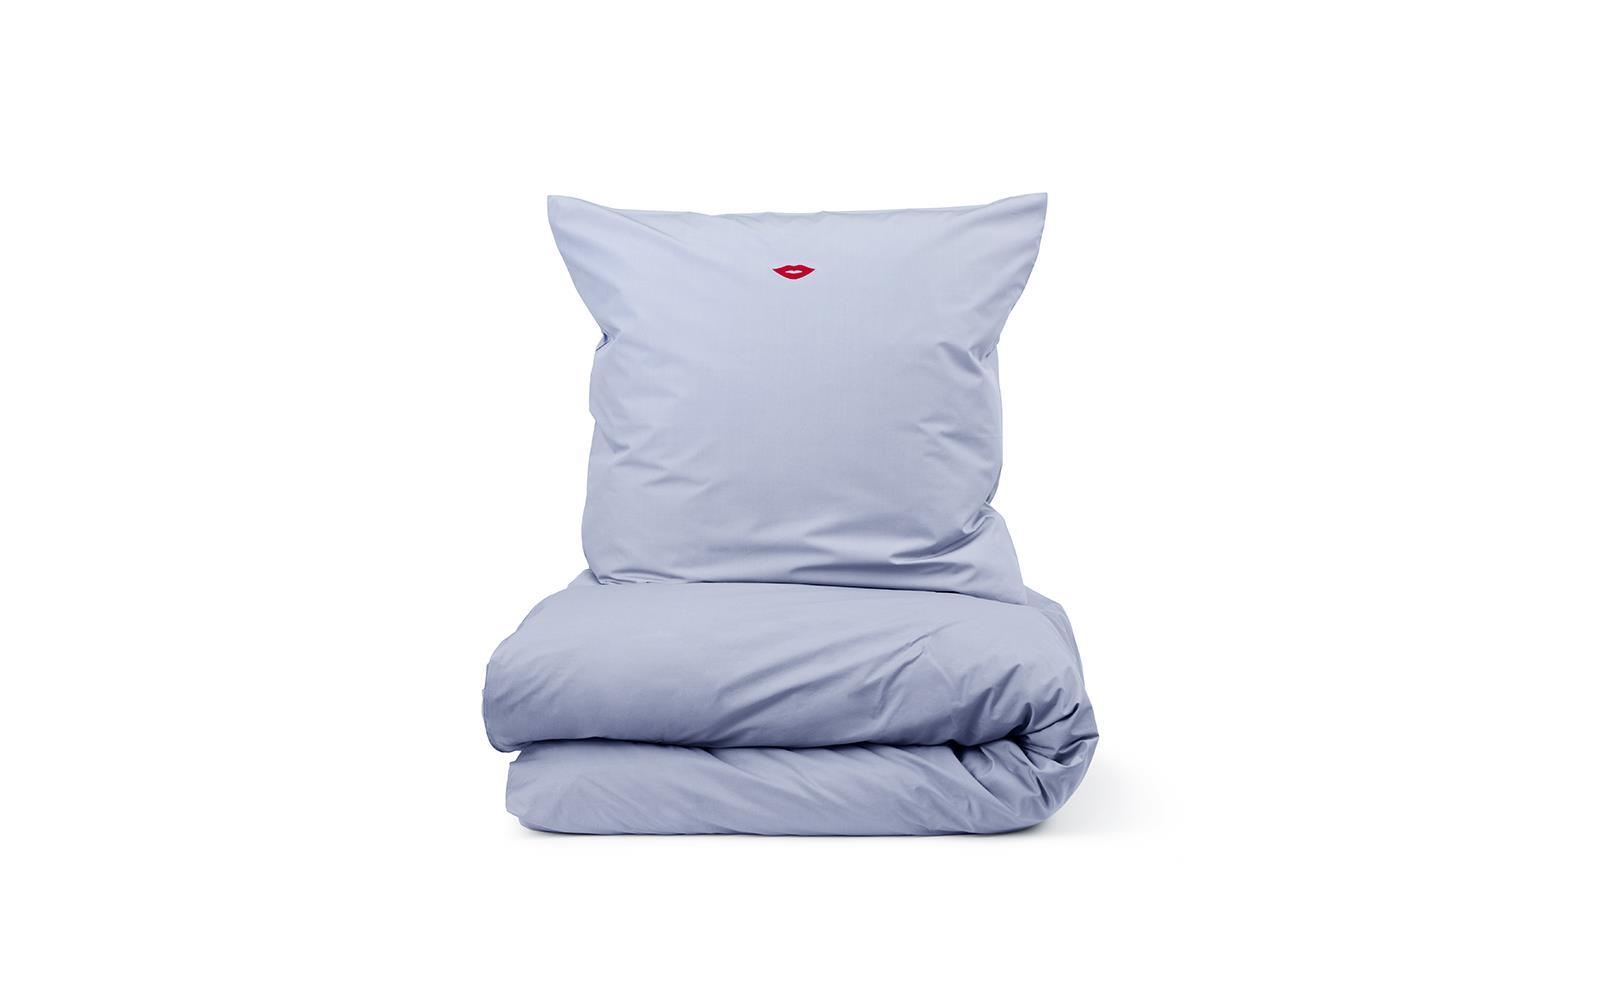 Normann Copenhagen - Snooze Bedding 140 x 200 cm - Sassy Chic Syren (310502)